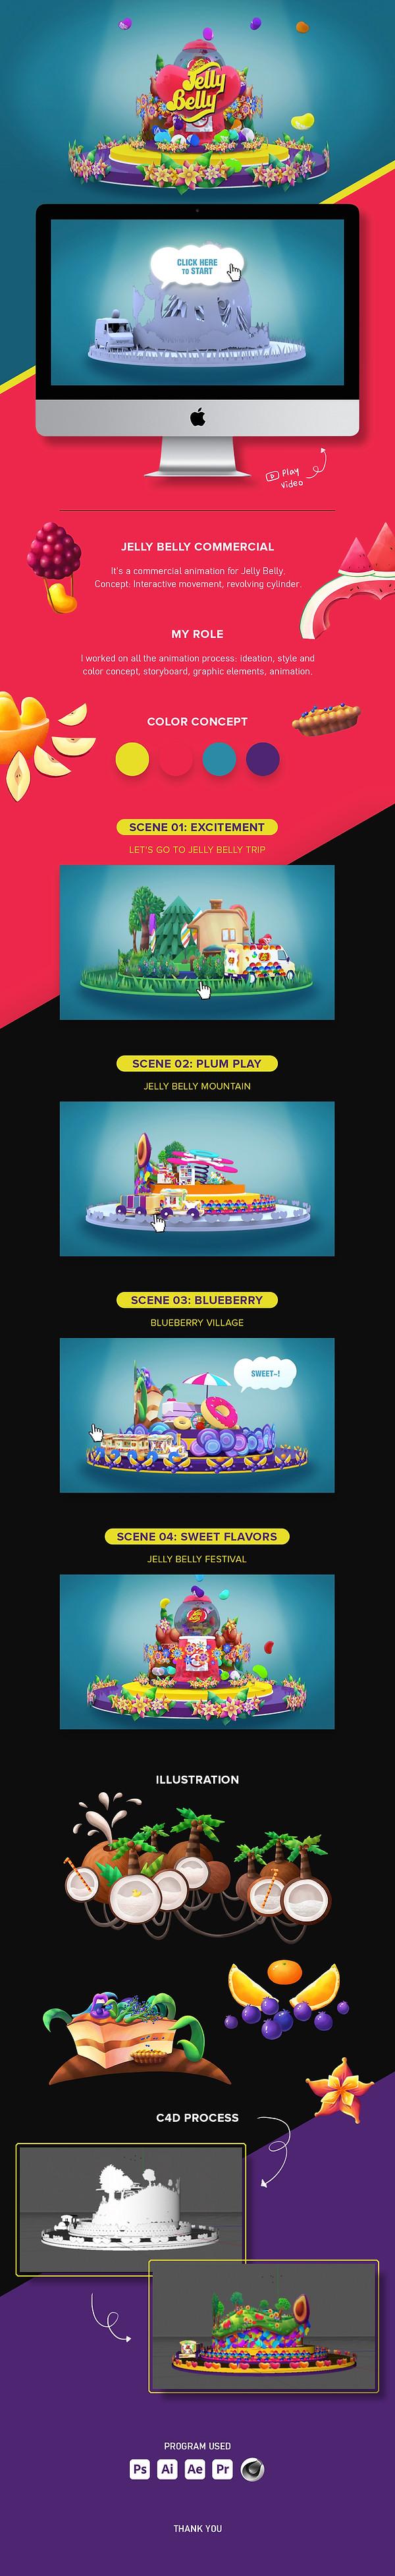 _Jelly Belly Trip.jpg